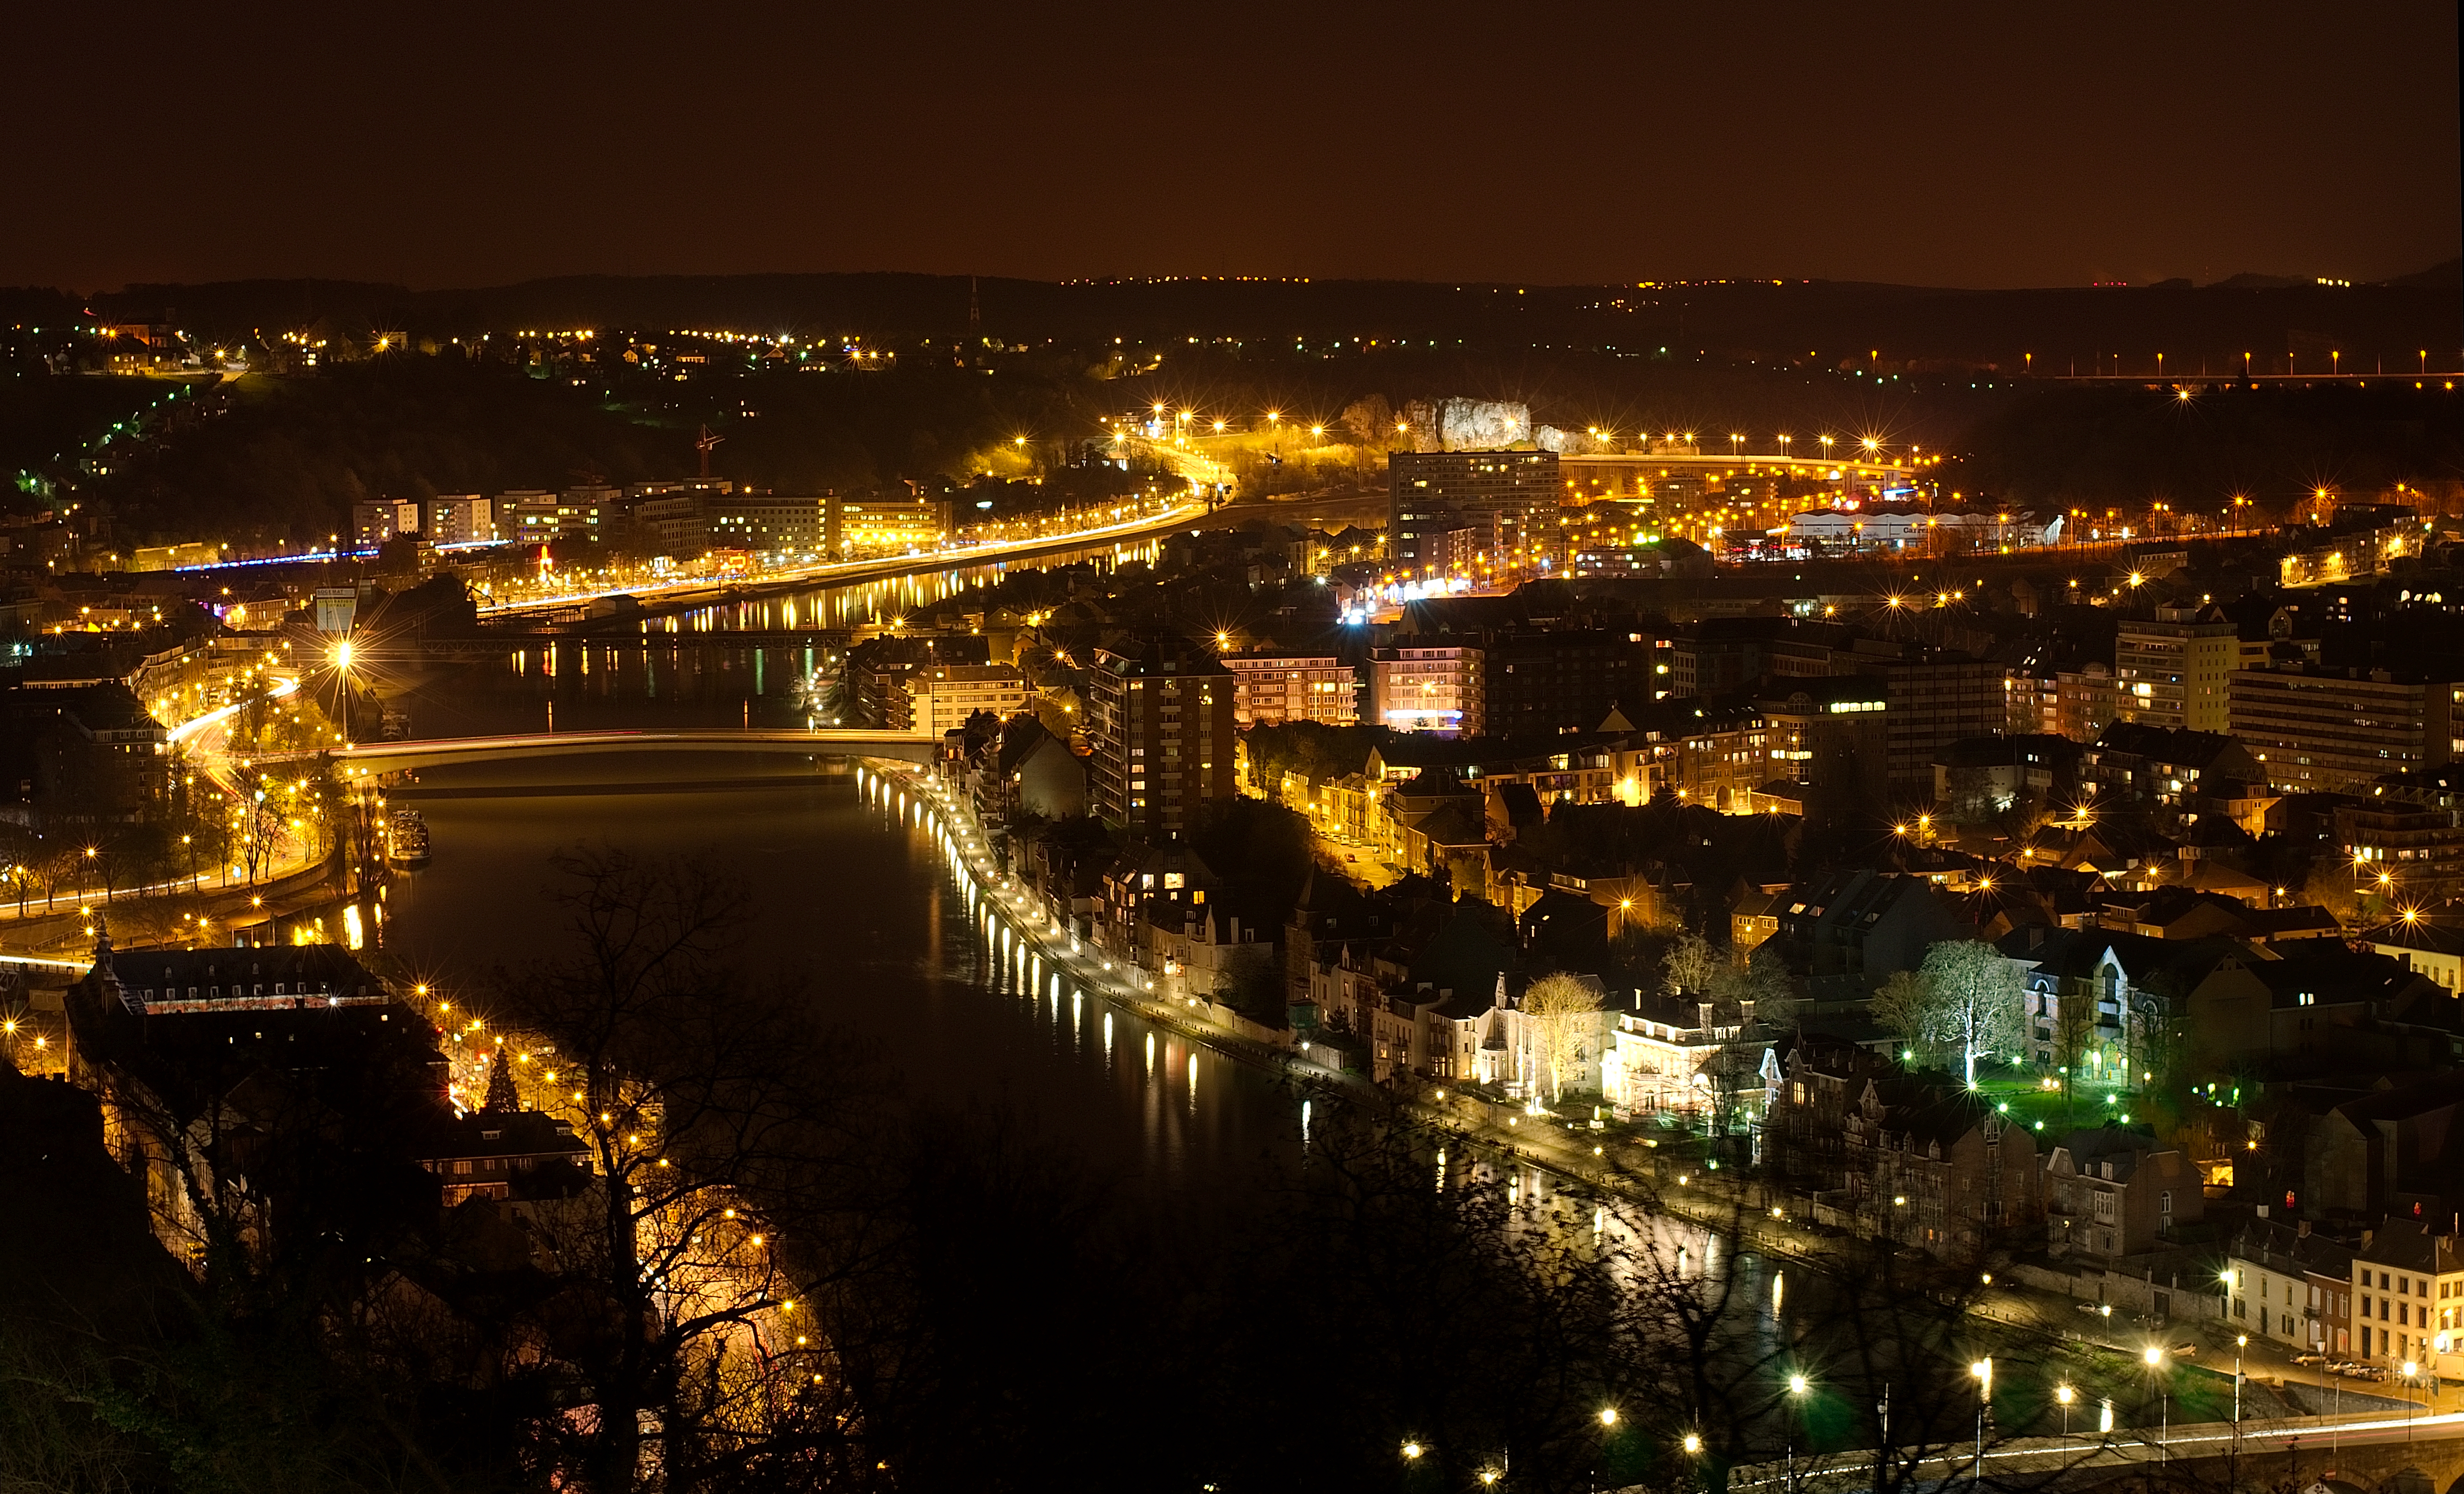 Http Commons Wikimedia Org Wiki File Namur By Night 1 Luc Viatour Jpg